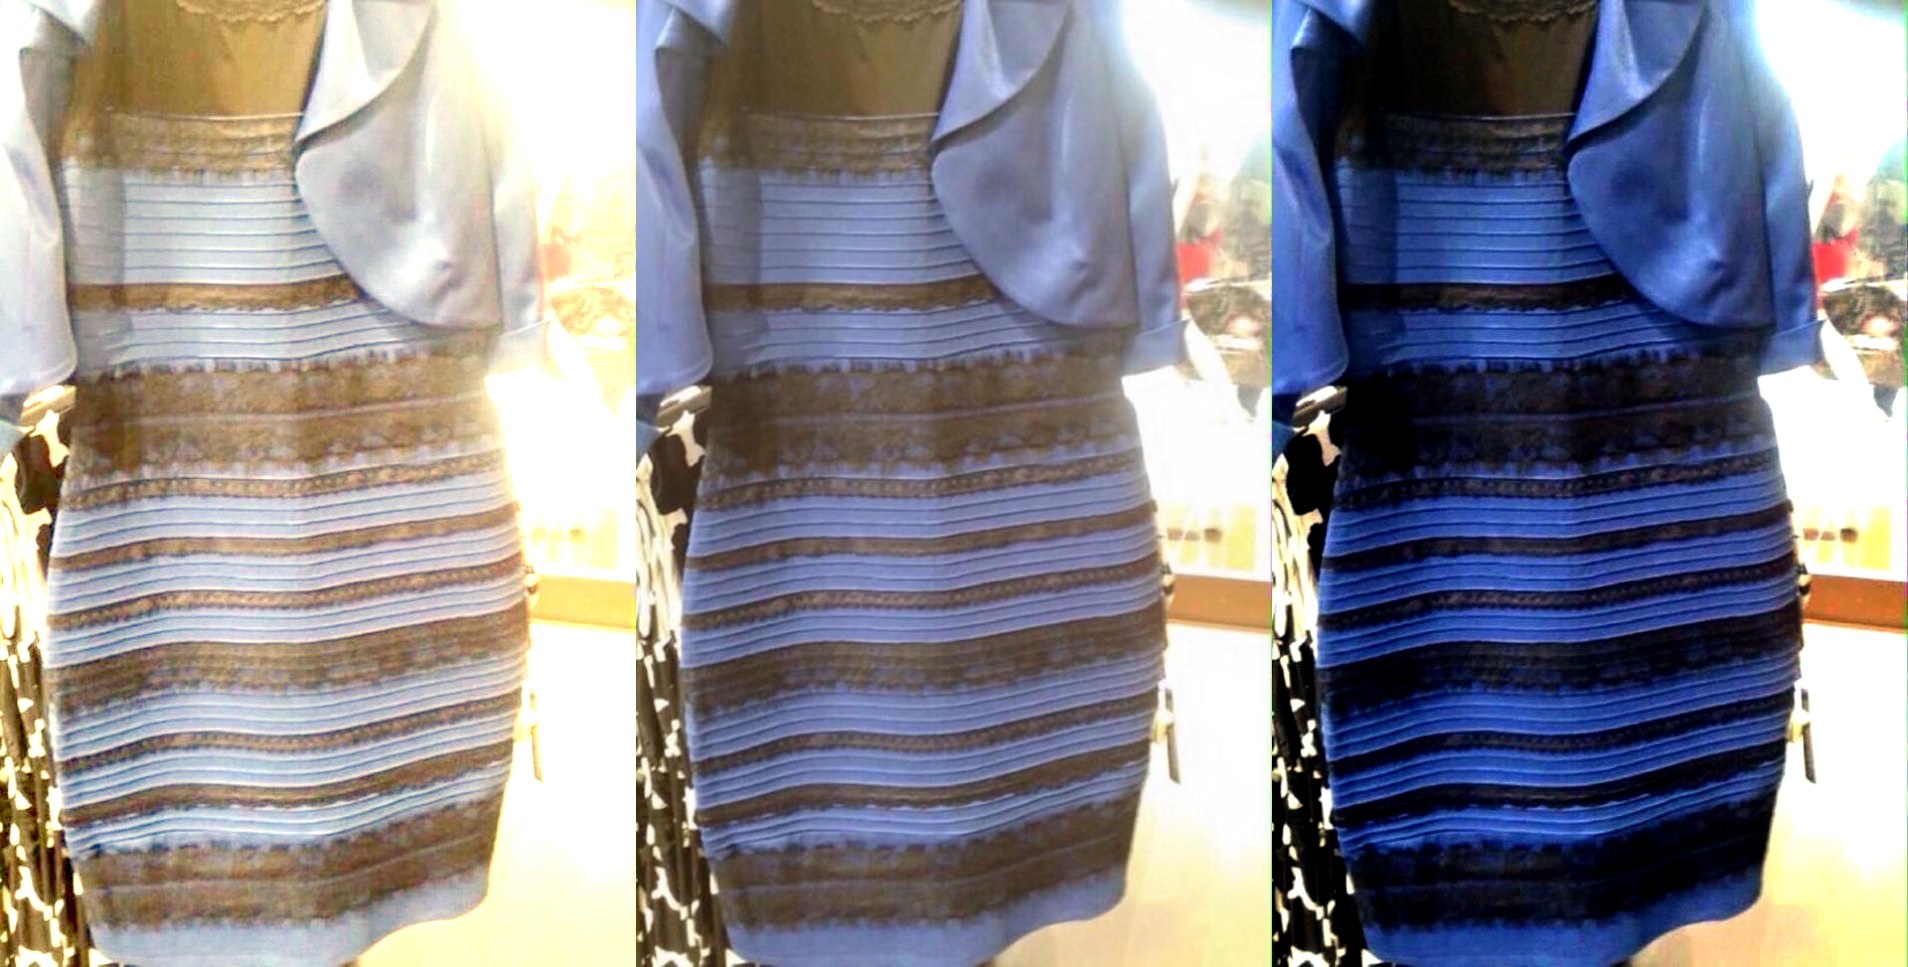 internet fads - the dress